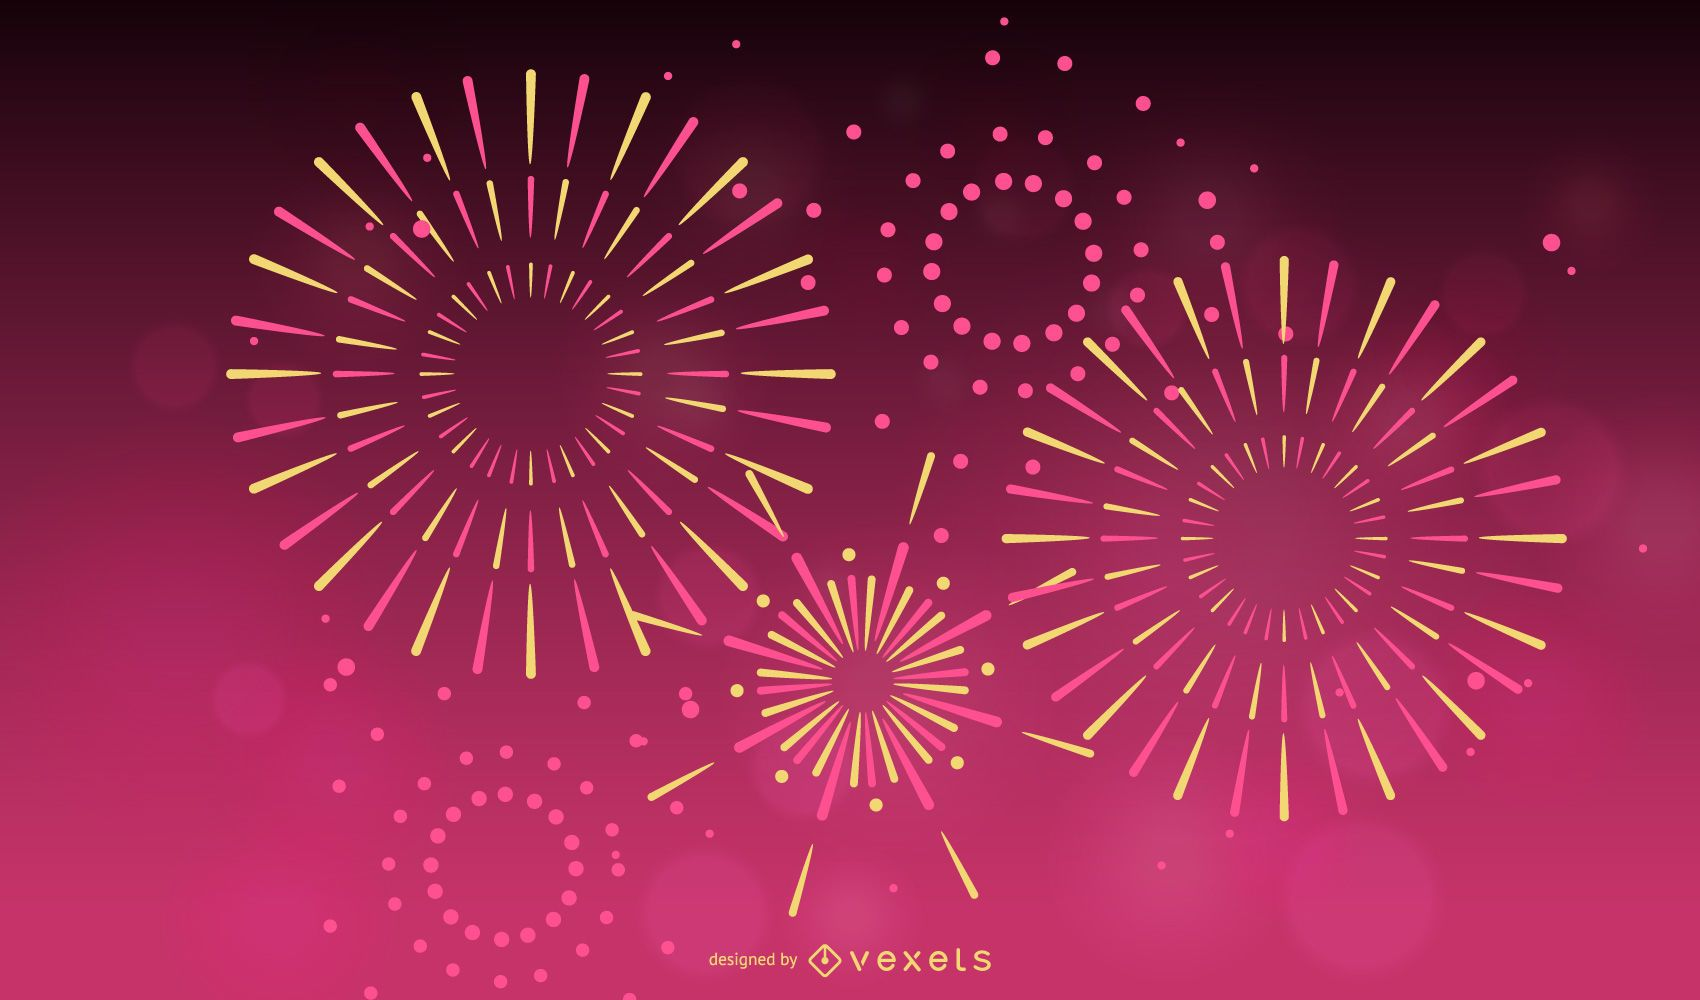 Bright Fireworks Effect